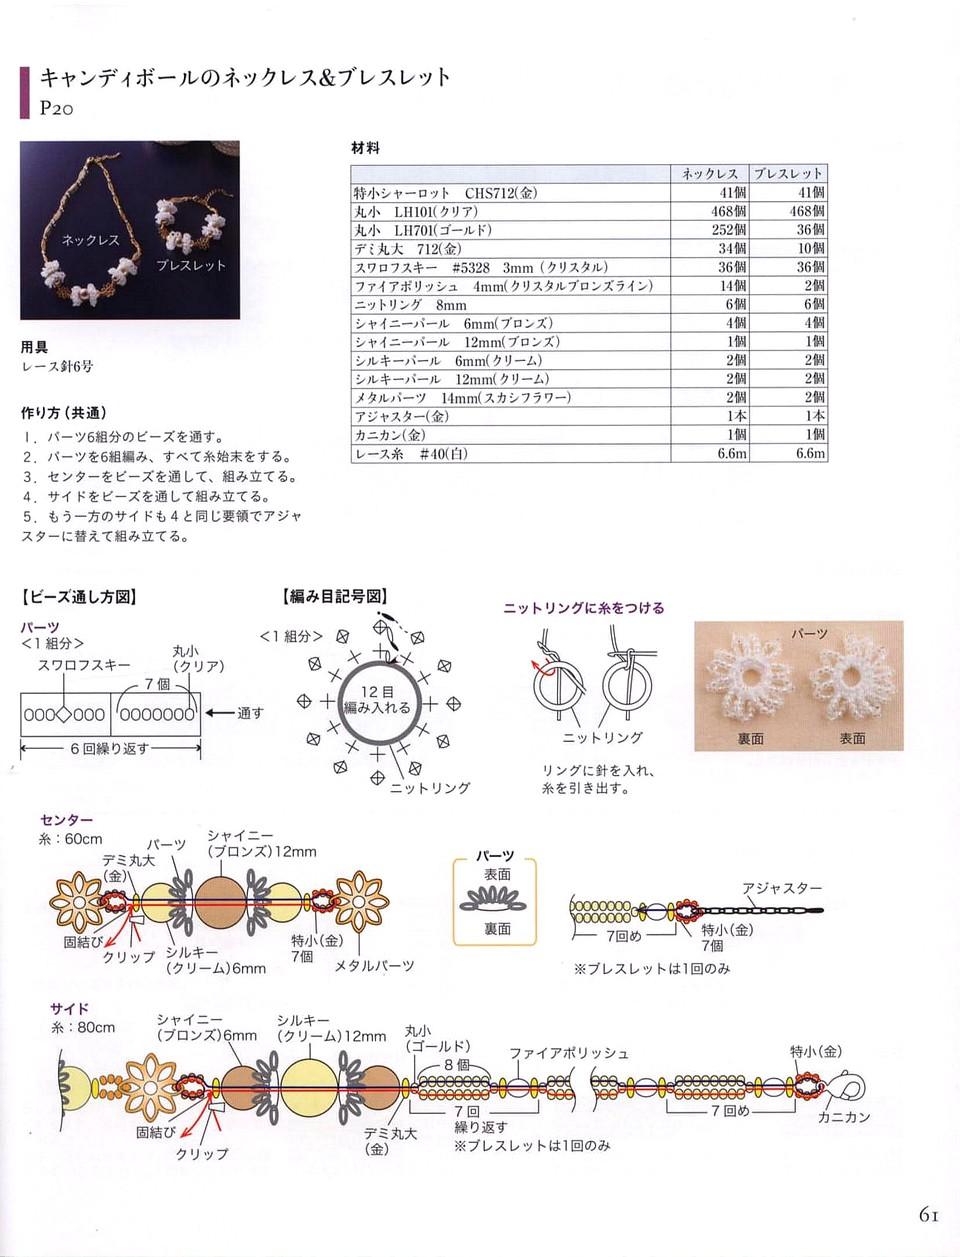 717 Beads Crochet 17-62